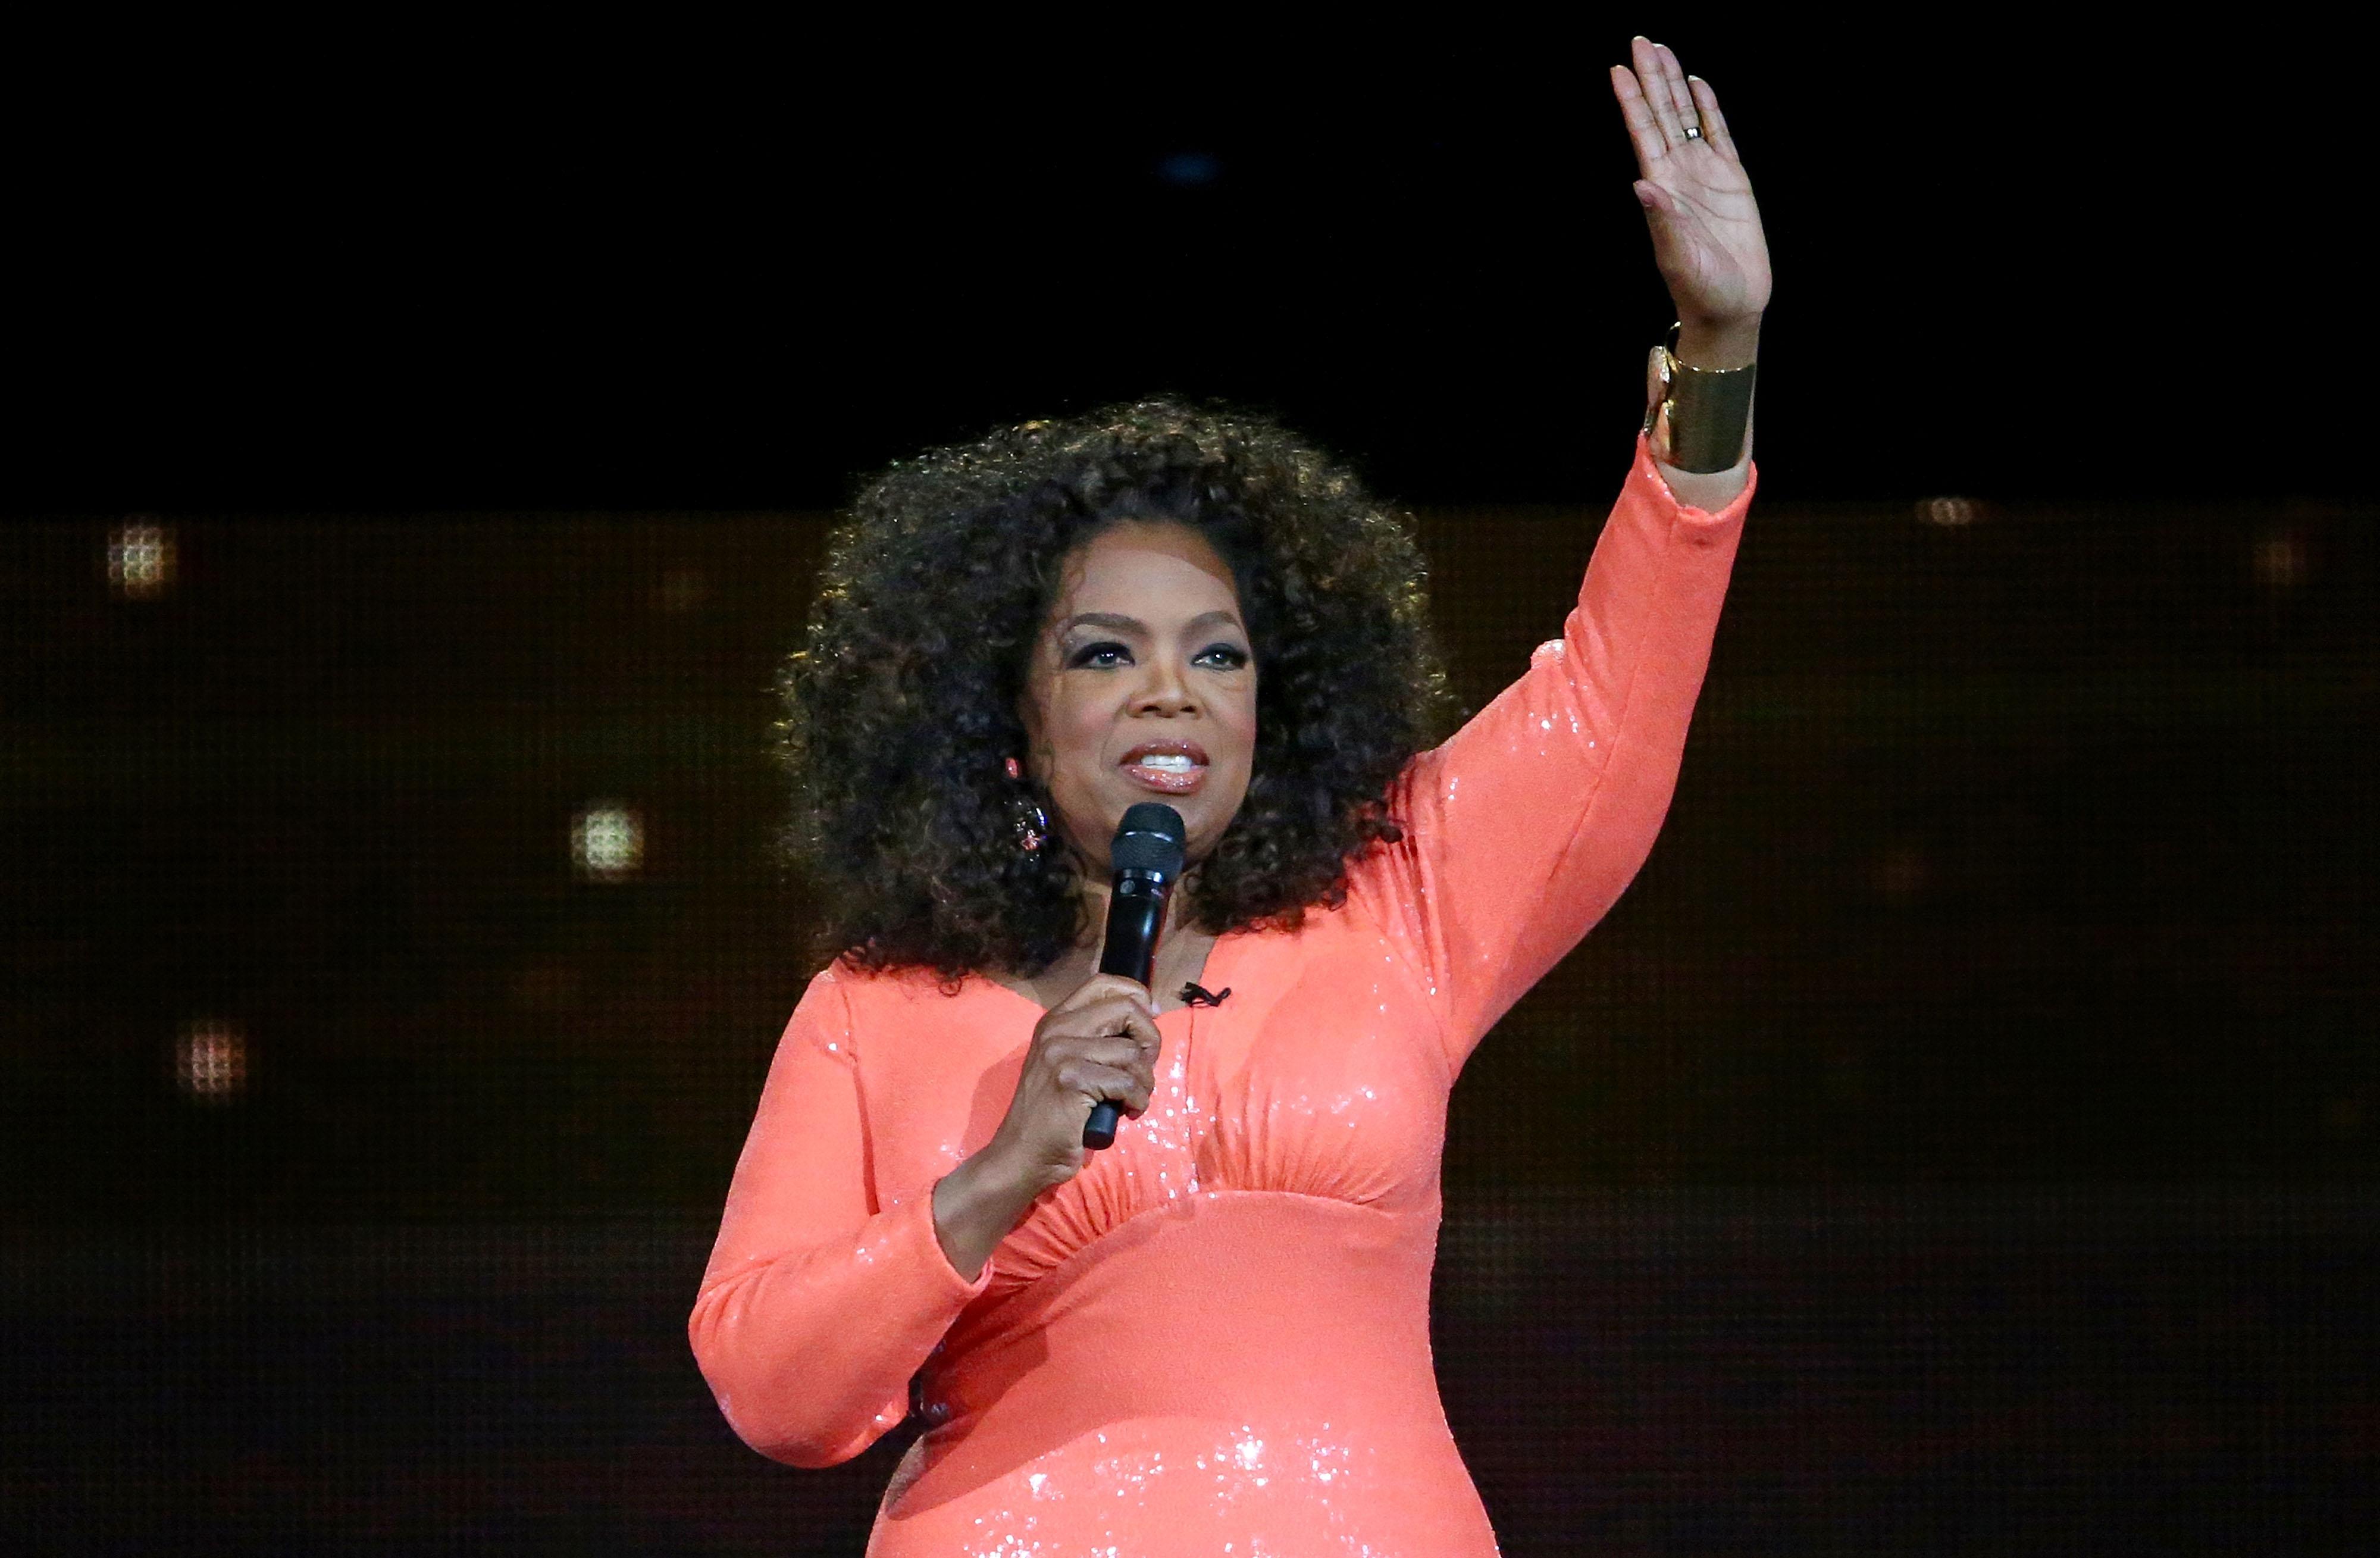 Oprah Winfrey at An Evening With Oprah tour in Melbourne, Australia on Dec. 2, 2015.